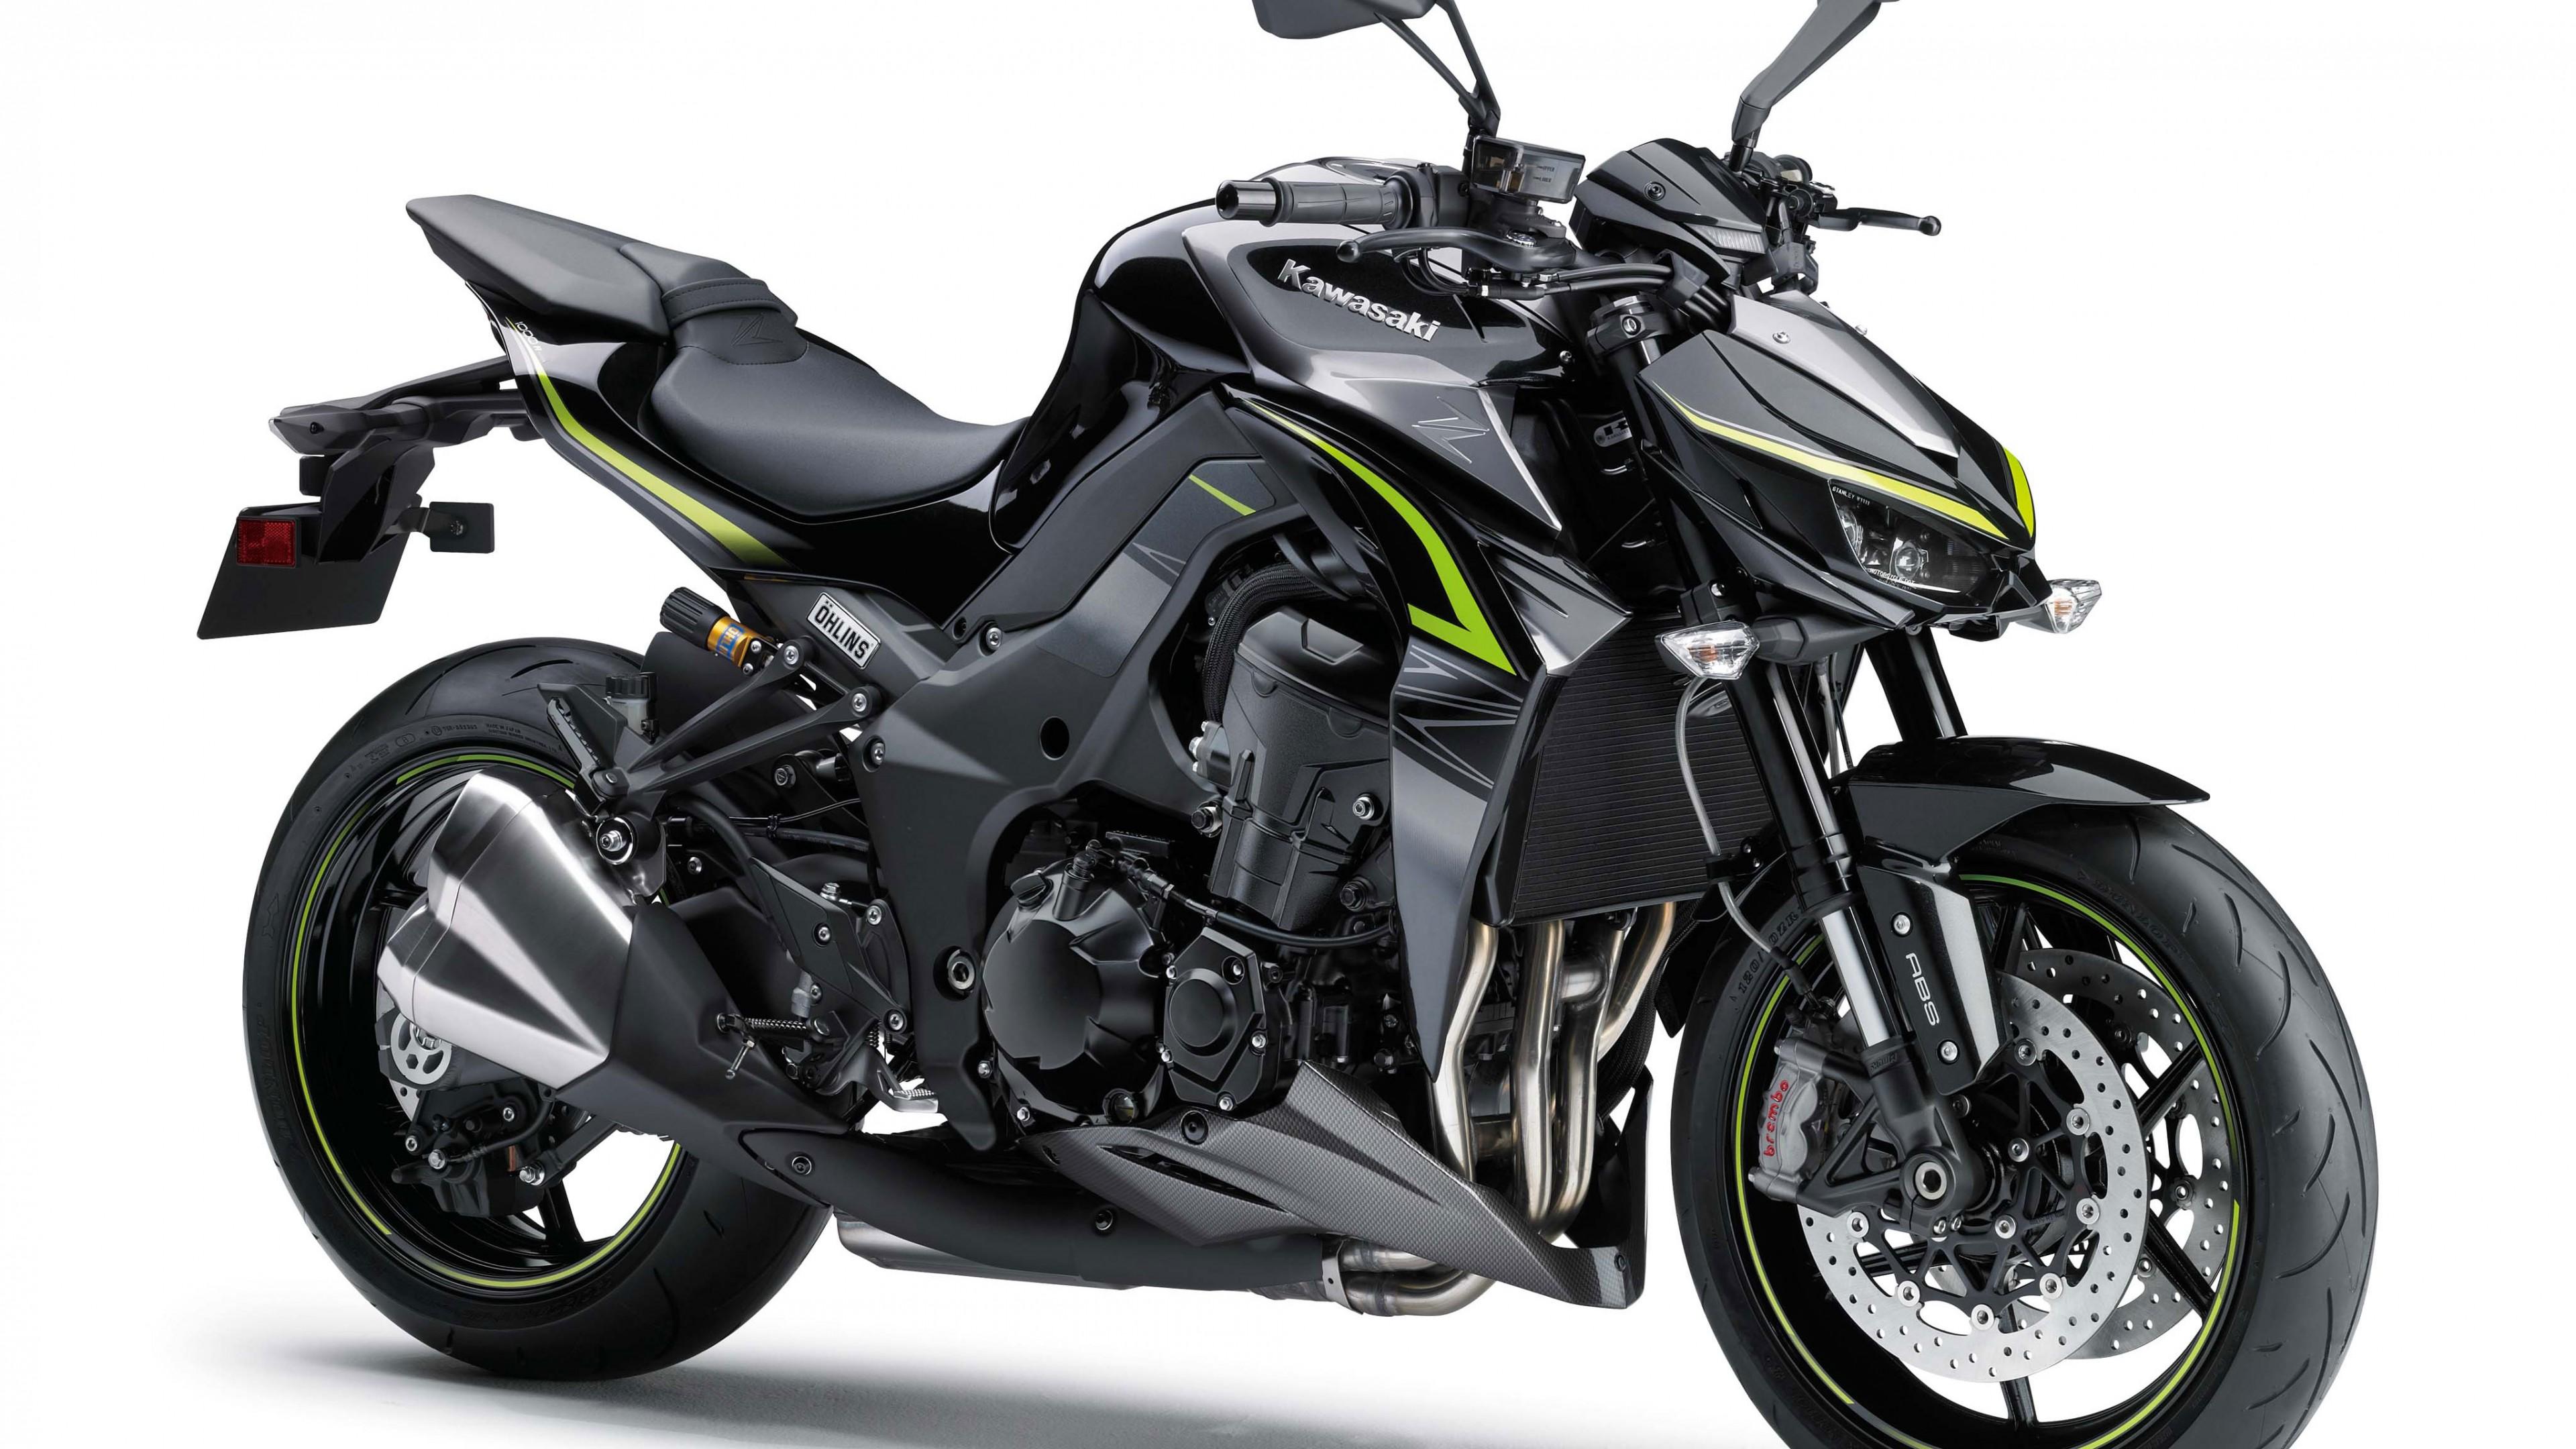 Wallpaper Kawasaki Z1000R, 2017 Bikes, 4k, Cars & Bikes #14753